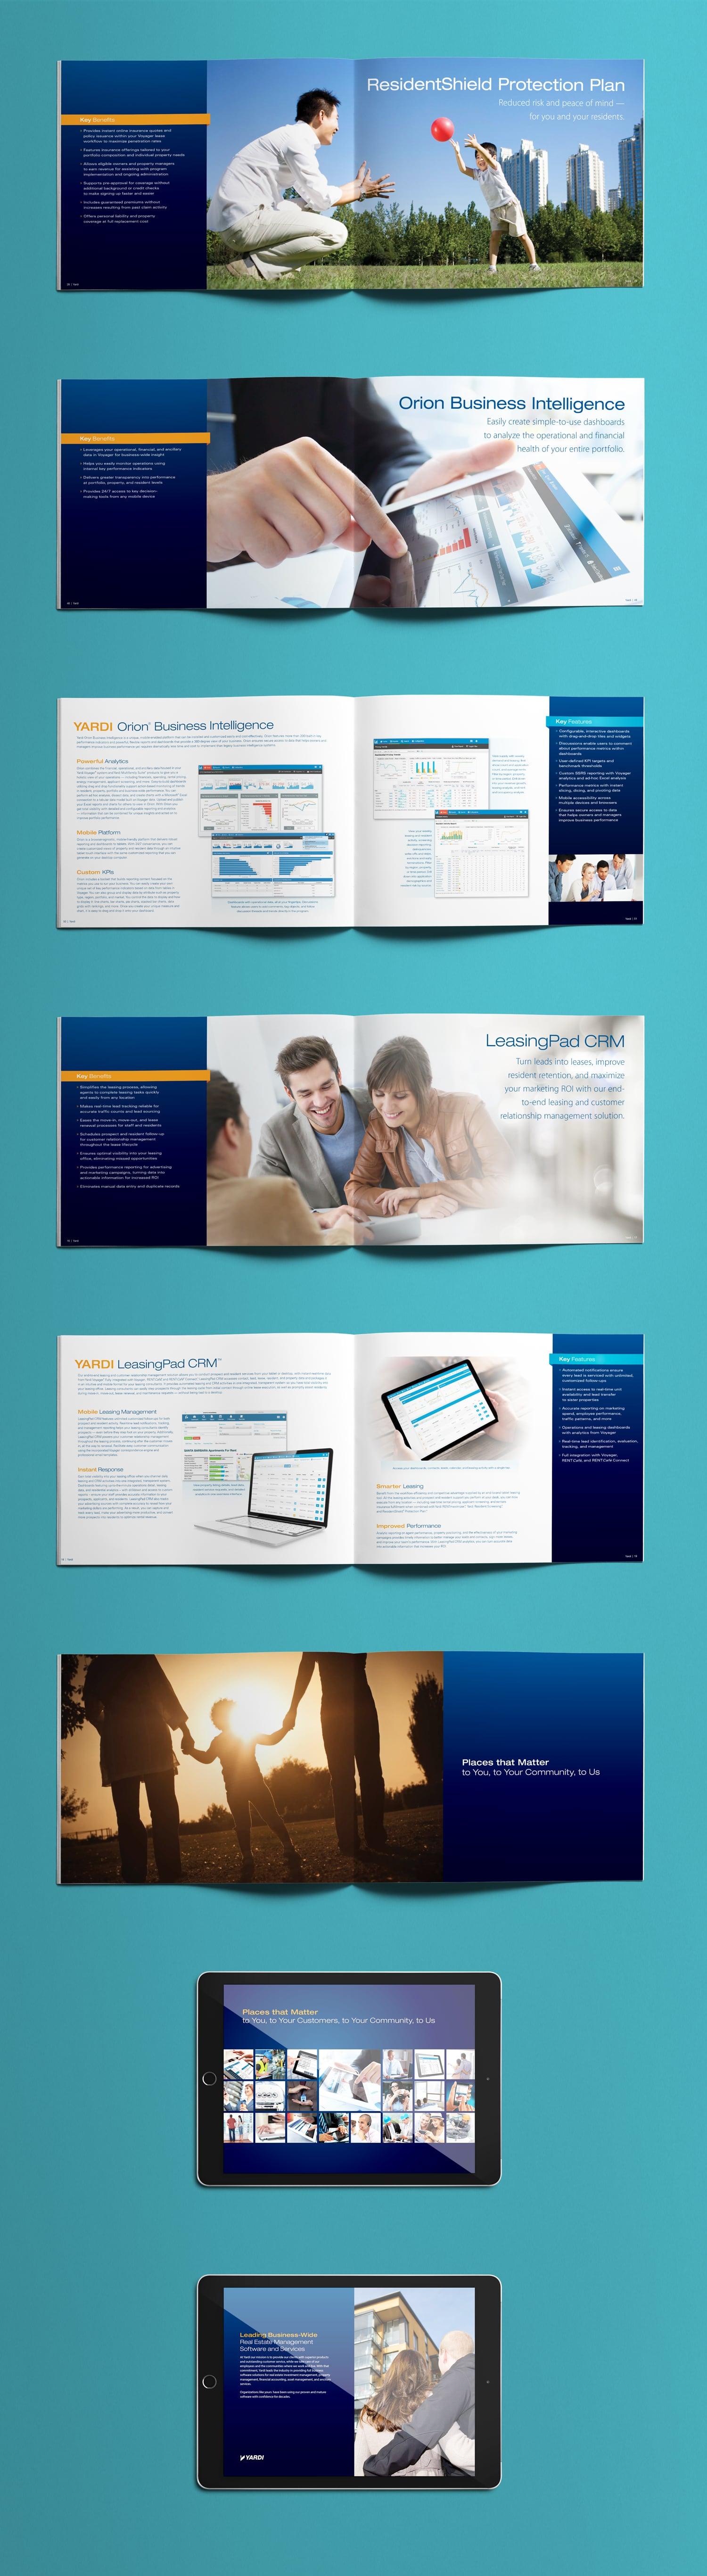 Multifamily Suite Brochure | Yardi —